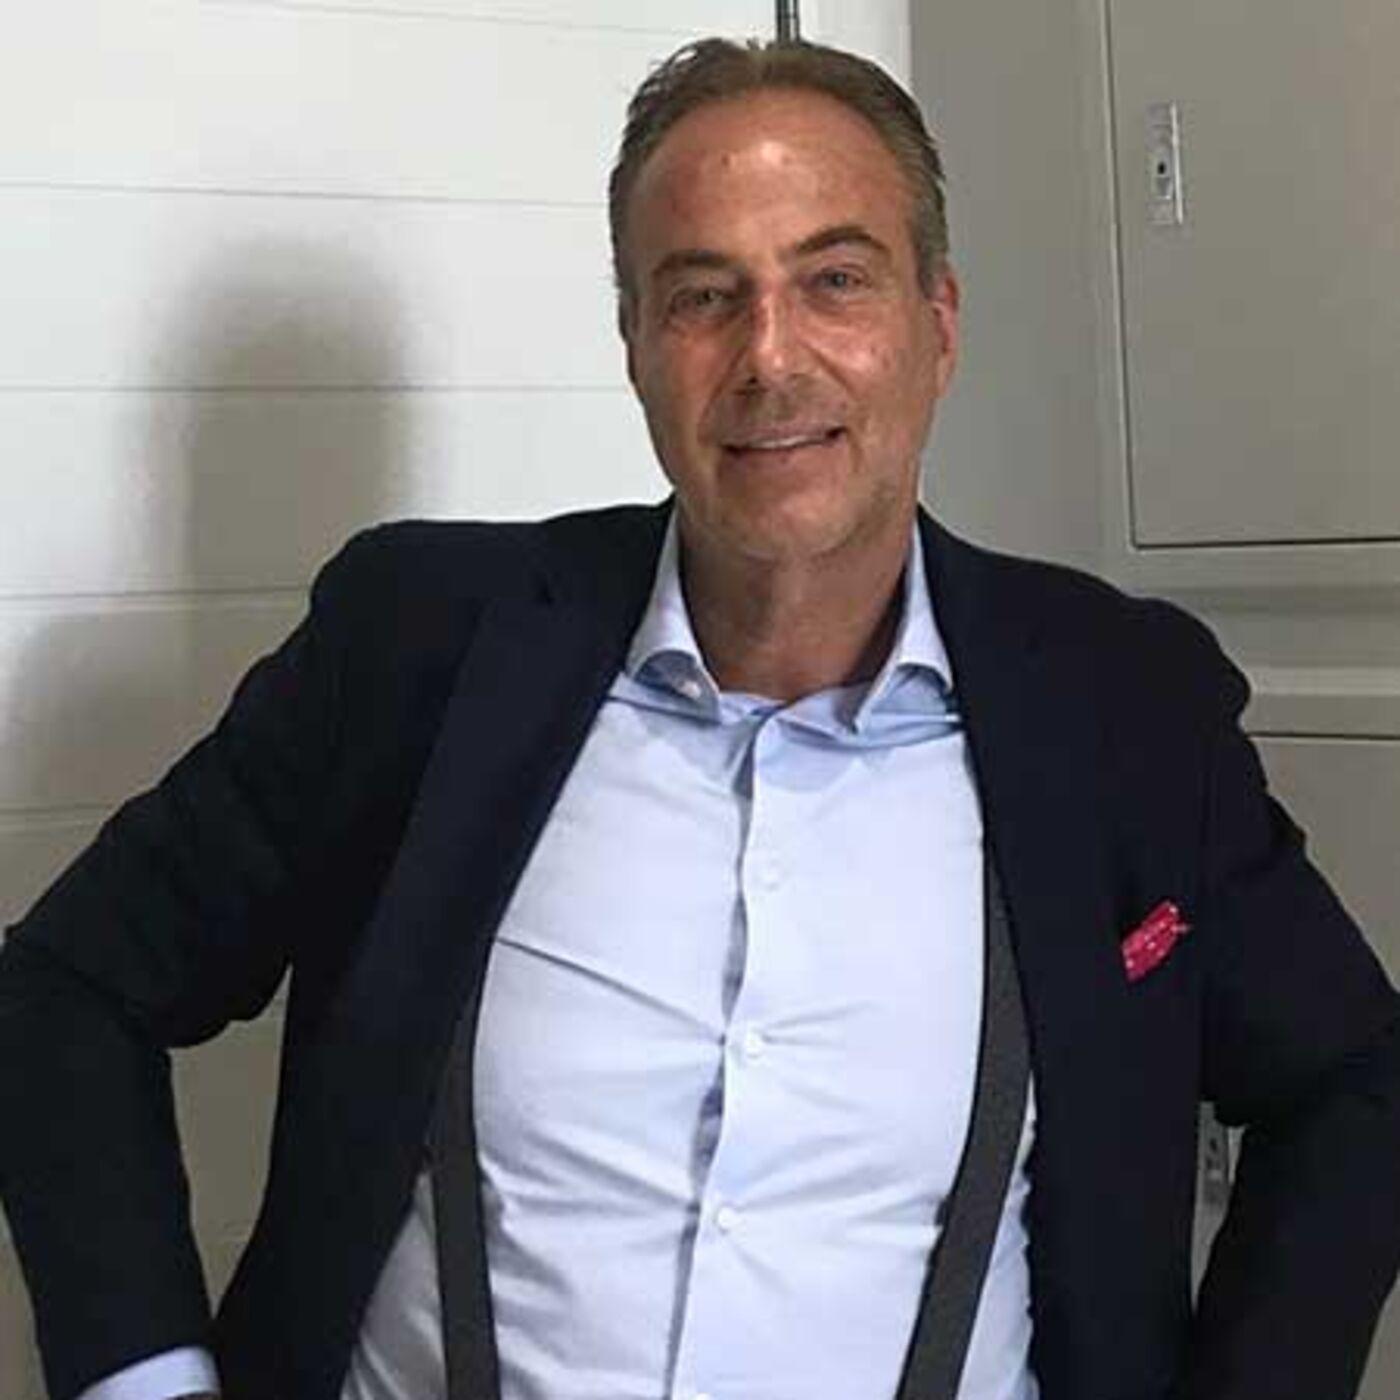 #110: Bruno Sidler Chief Operating Officer of Lonrho & Board Member at Bertschi, E2Log, Global Airlift